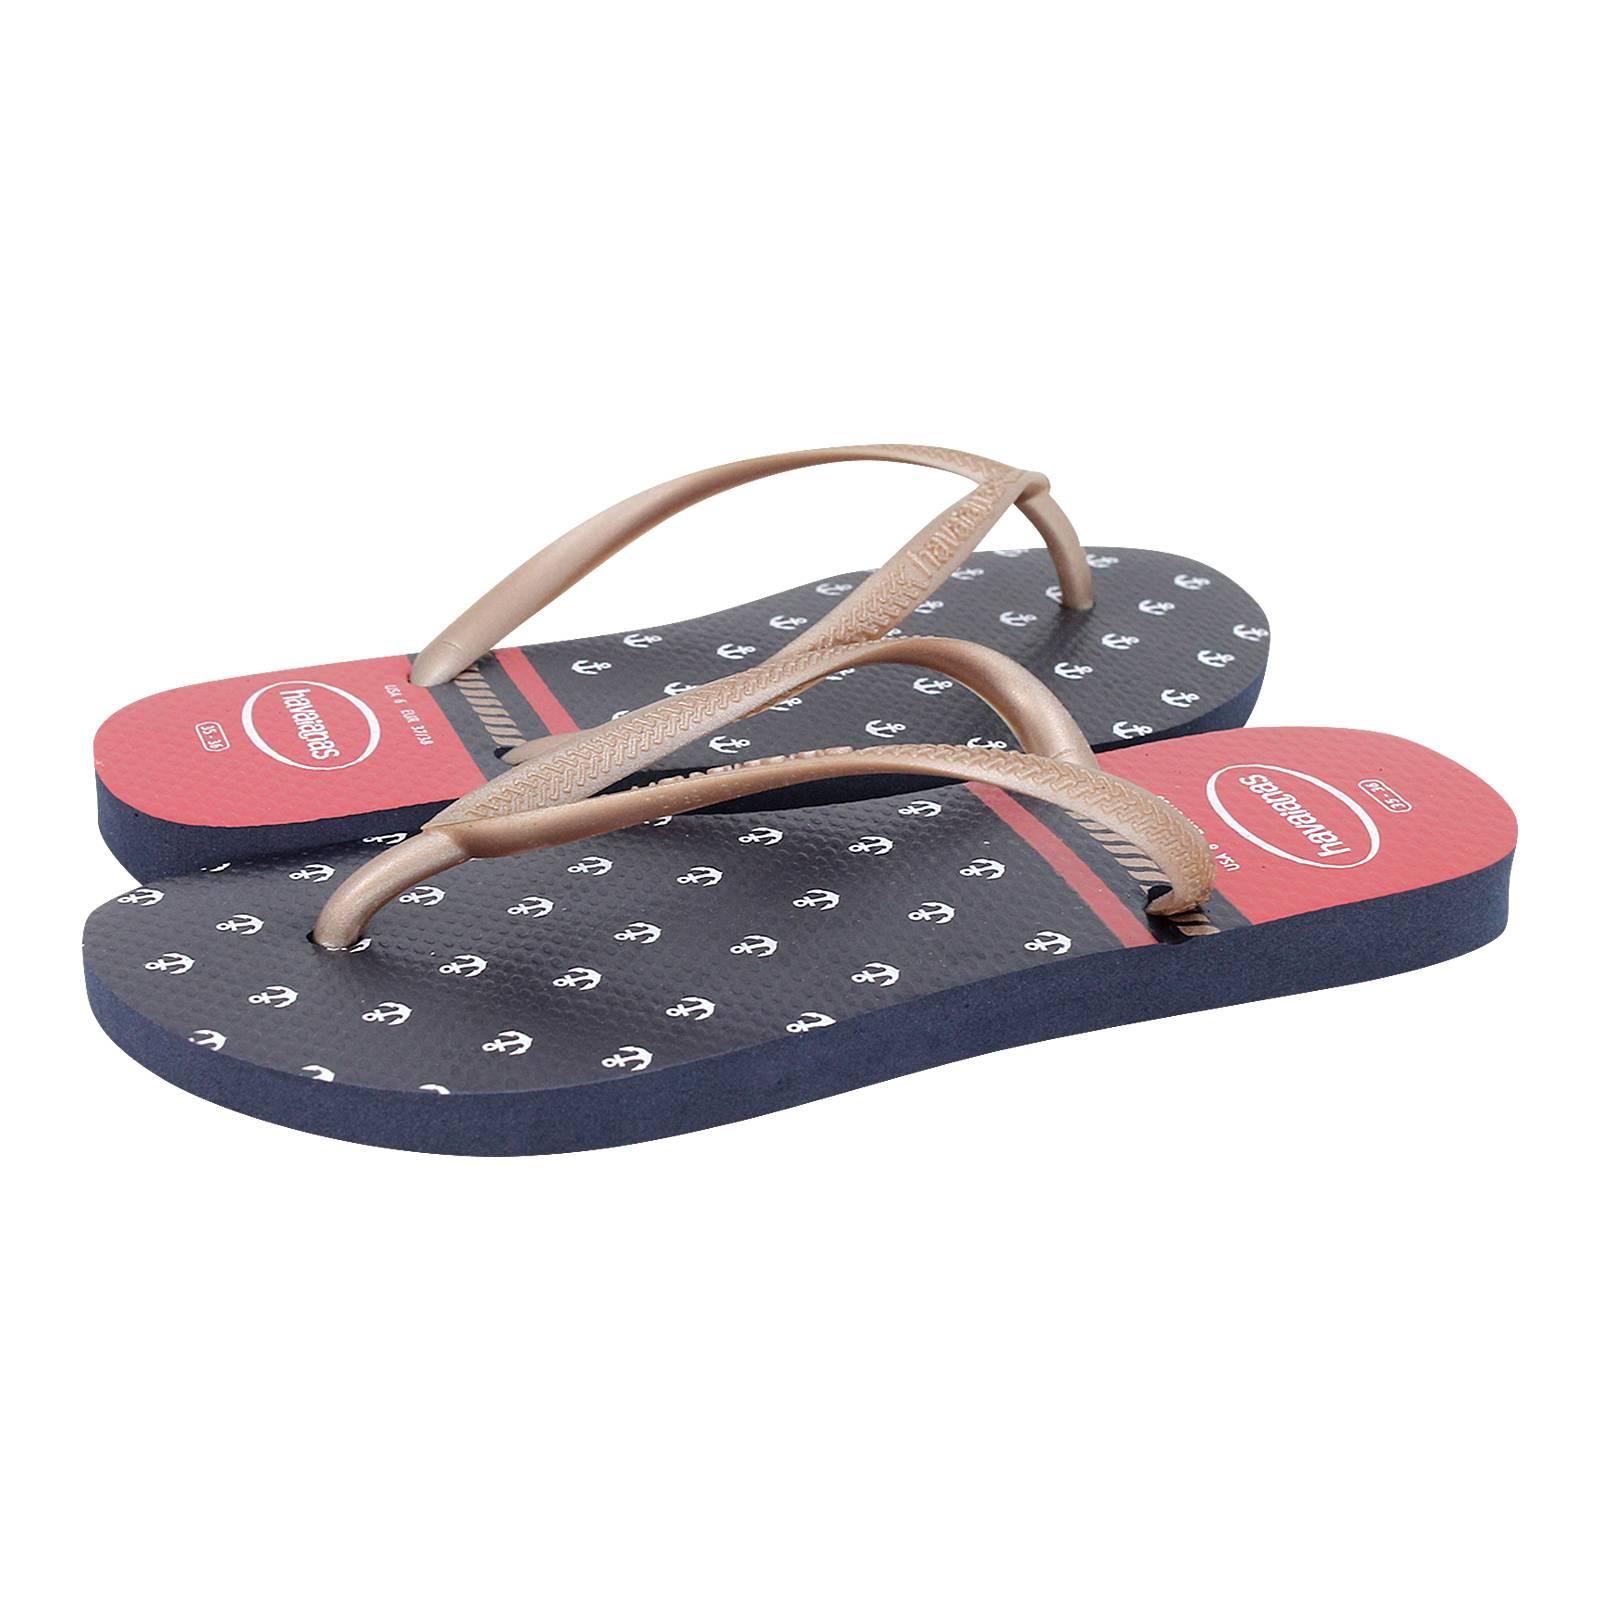 0b413d0a22f Slim Nautical - Havaianas Women s flat sandals made of pvc - Gianna ...